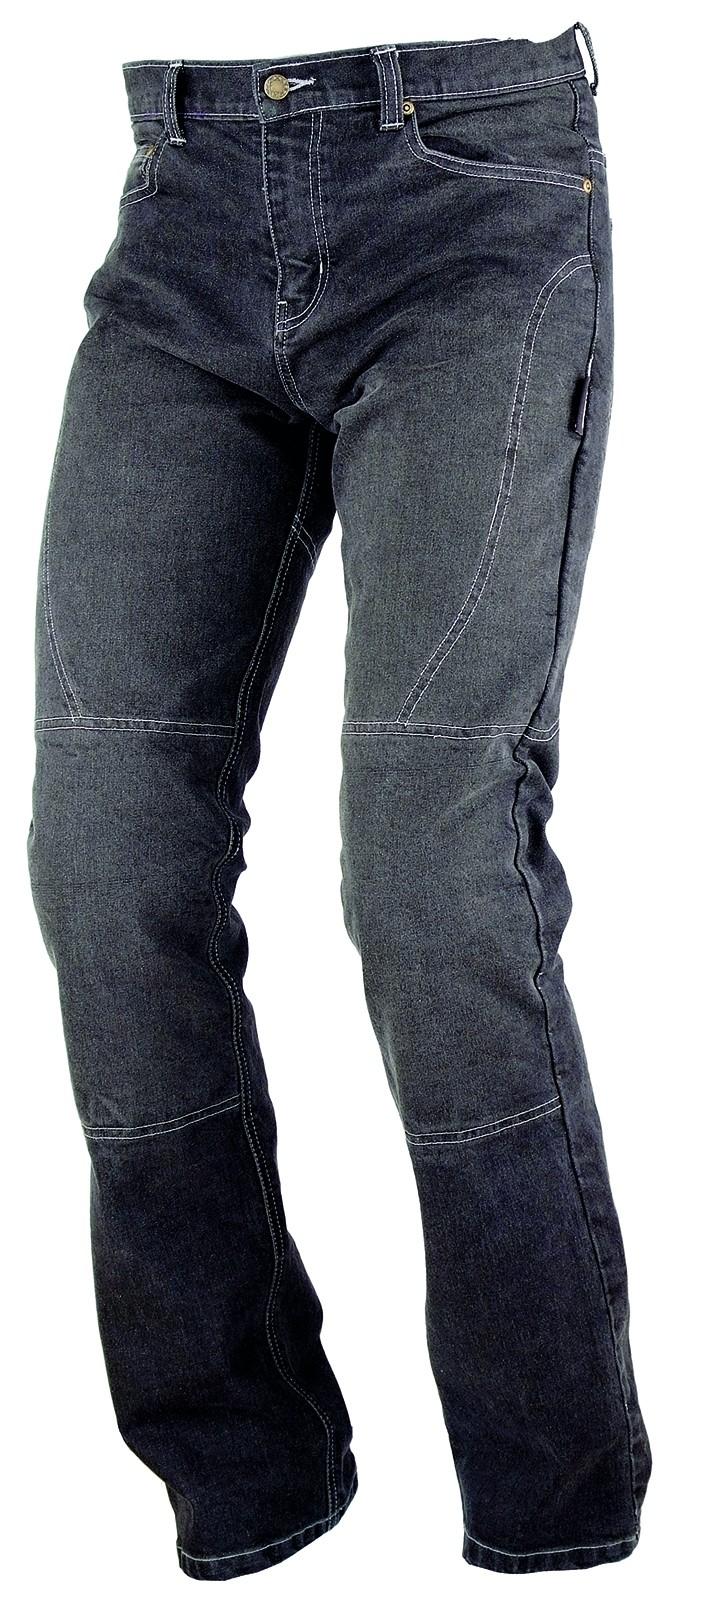 Jeans Donna Pantaloni Lady Moto Protezioni Omologate Rinforzi Aramid nero